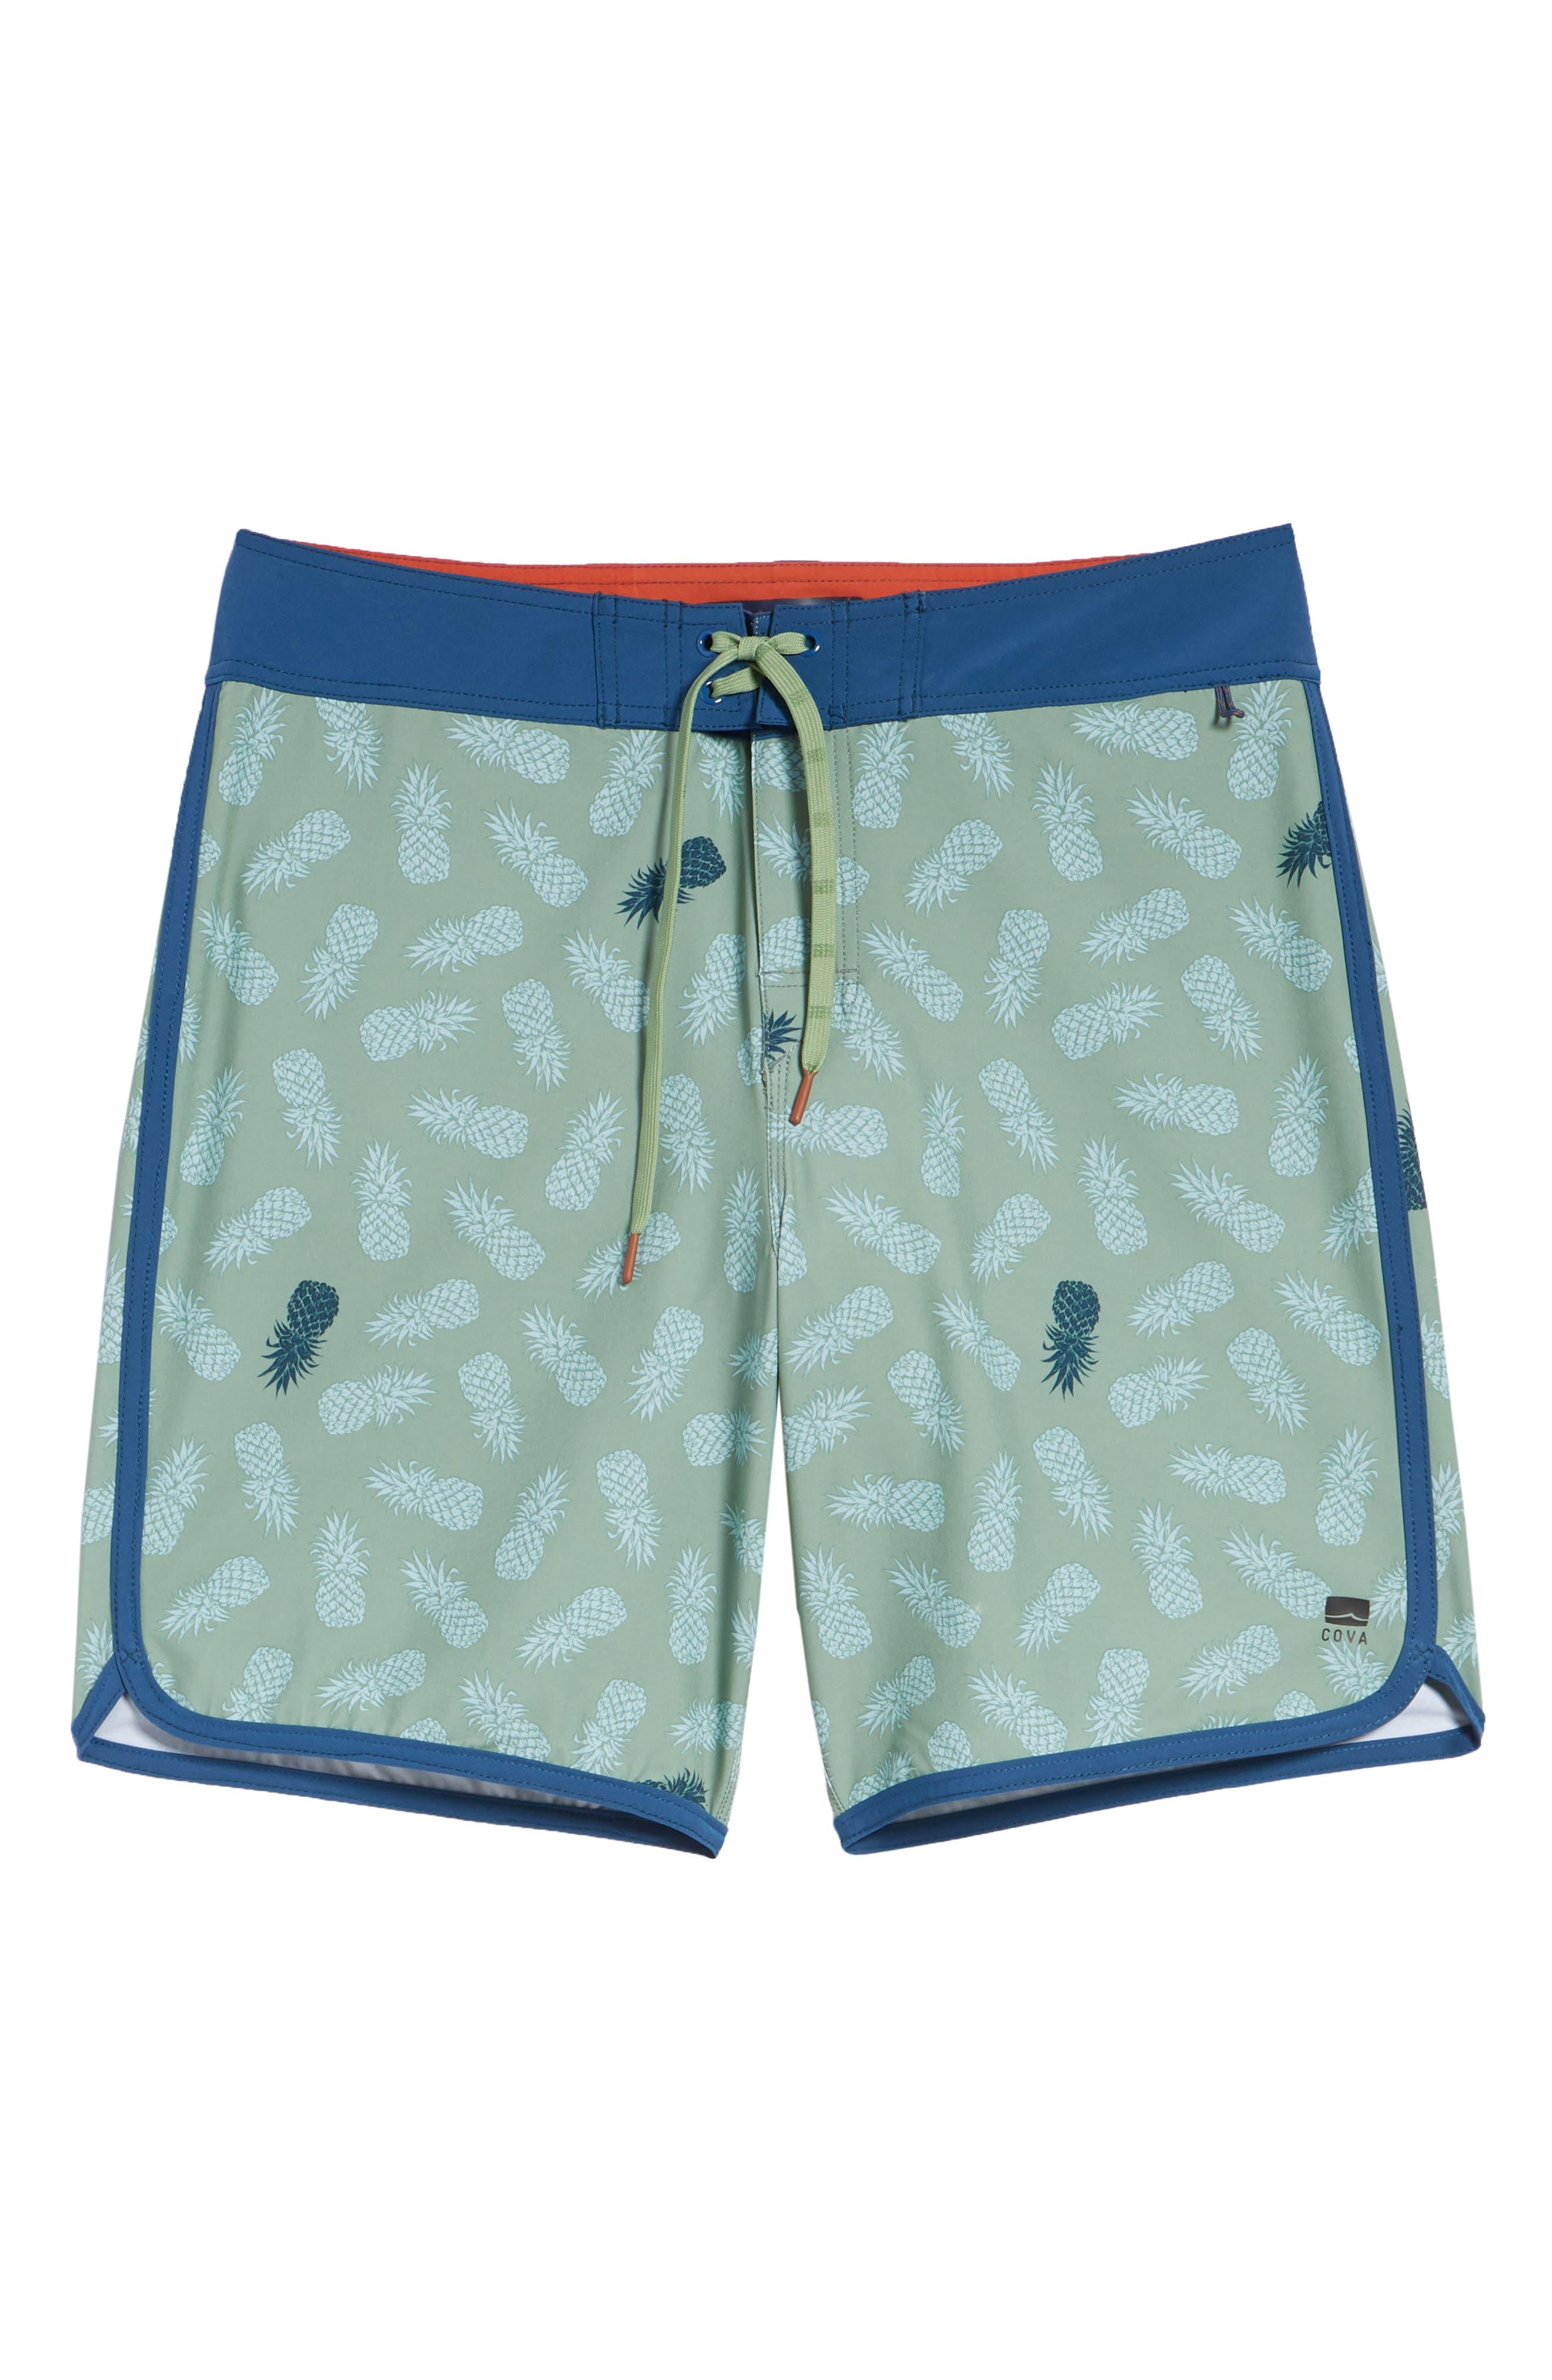 Colada Regular Fit Board Shorts,                             Alternate thumbnail 6, color,                             BASIL GREEN